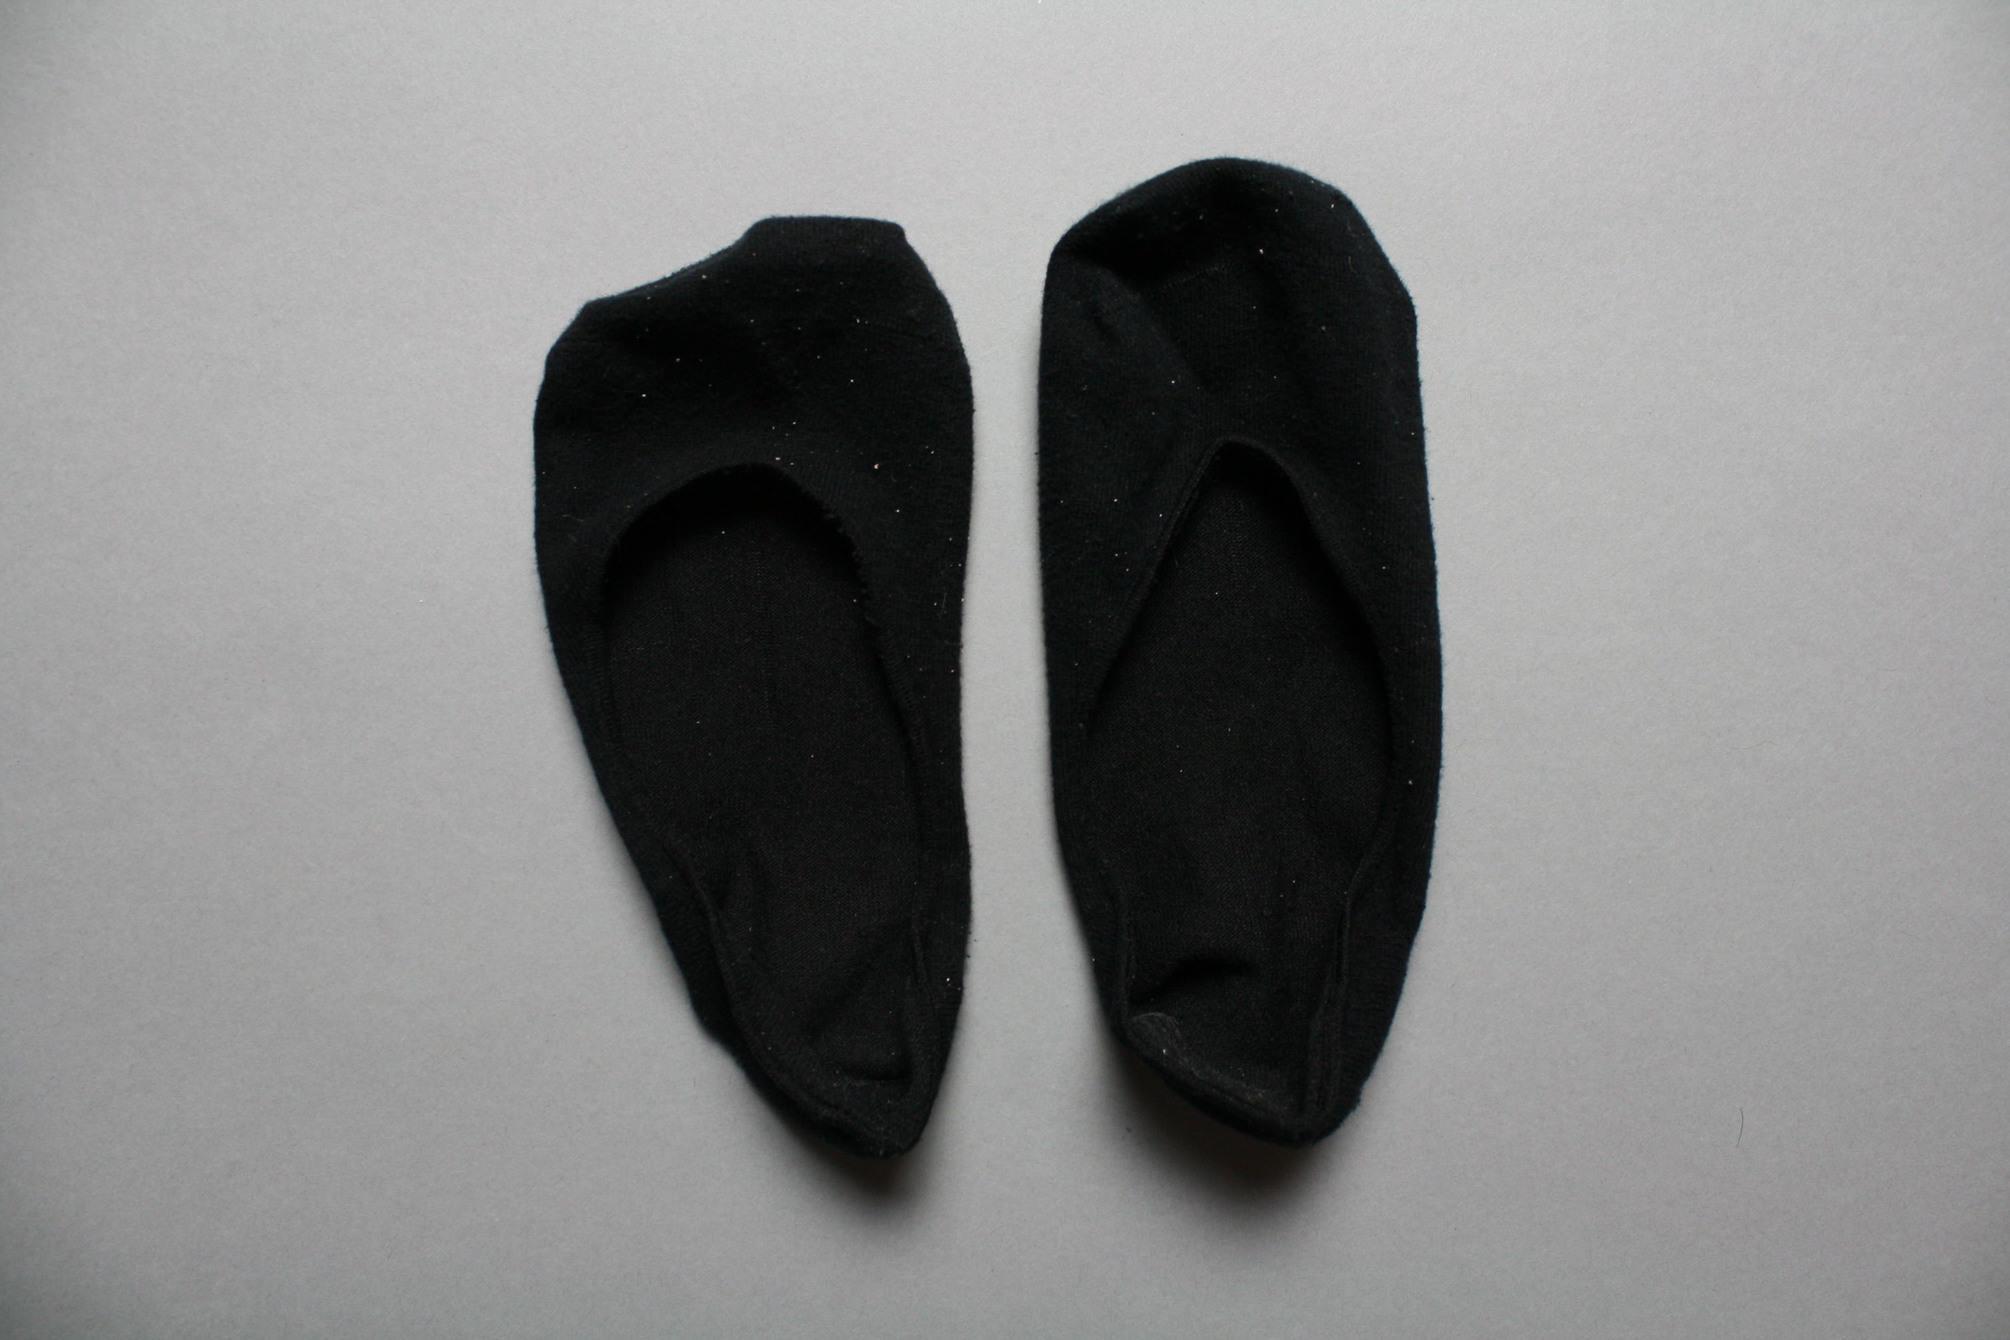 Stomper Joe no show socks